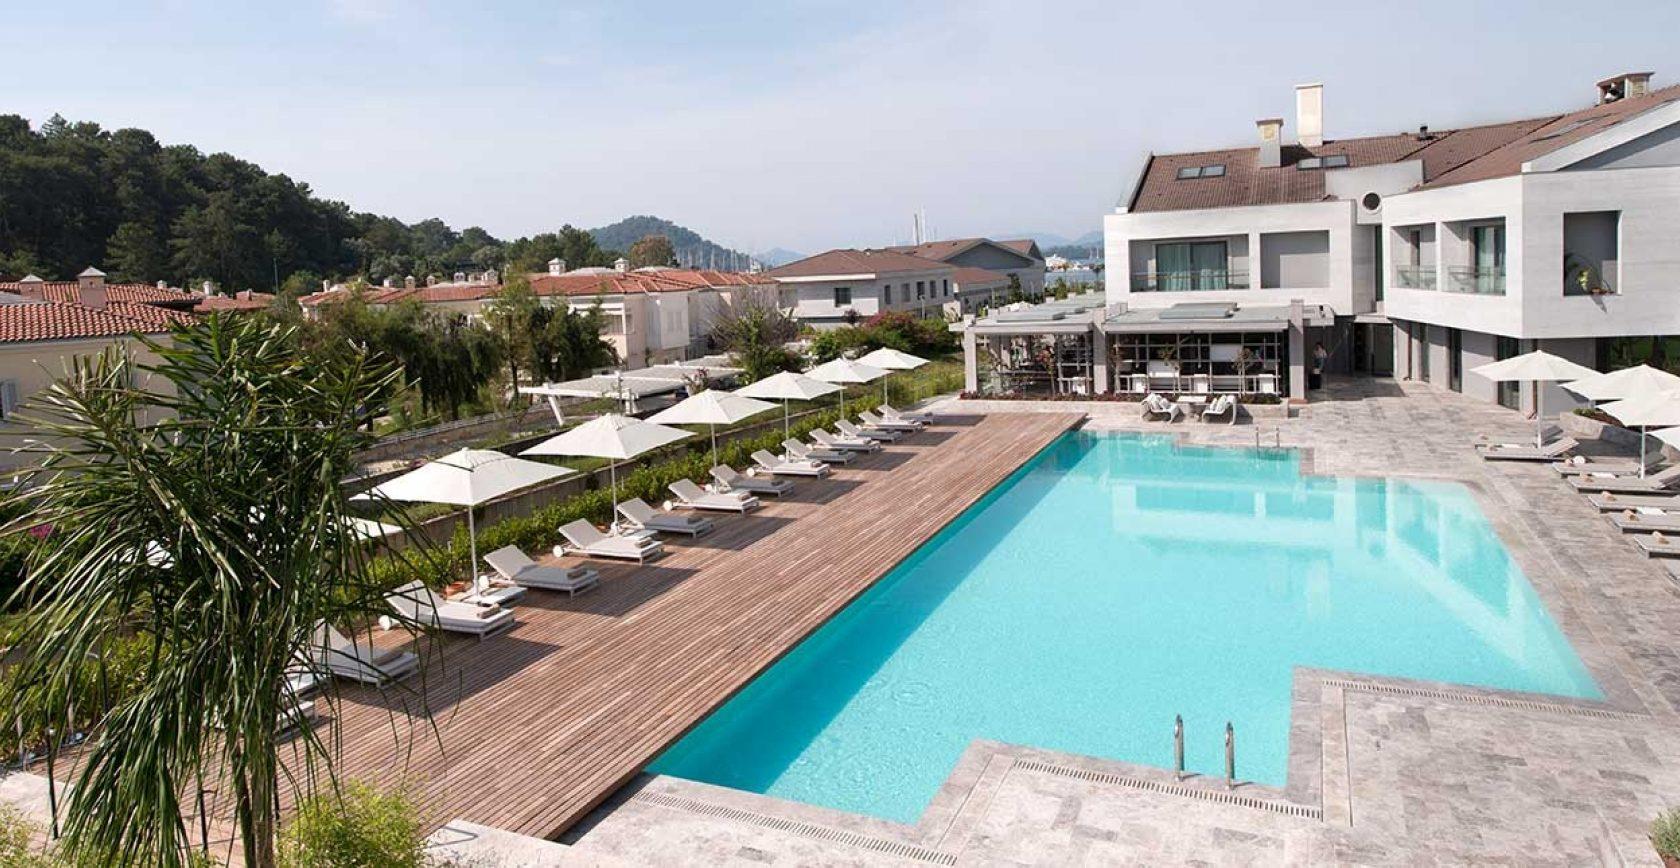 D resort Gocek (6).jpg